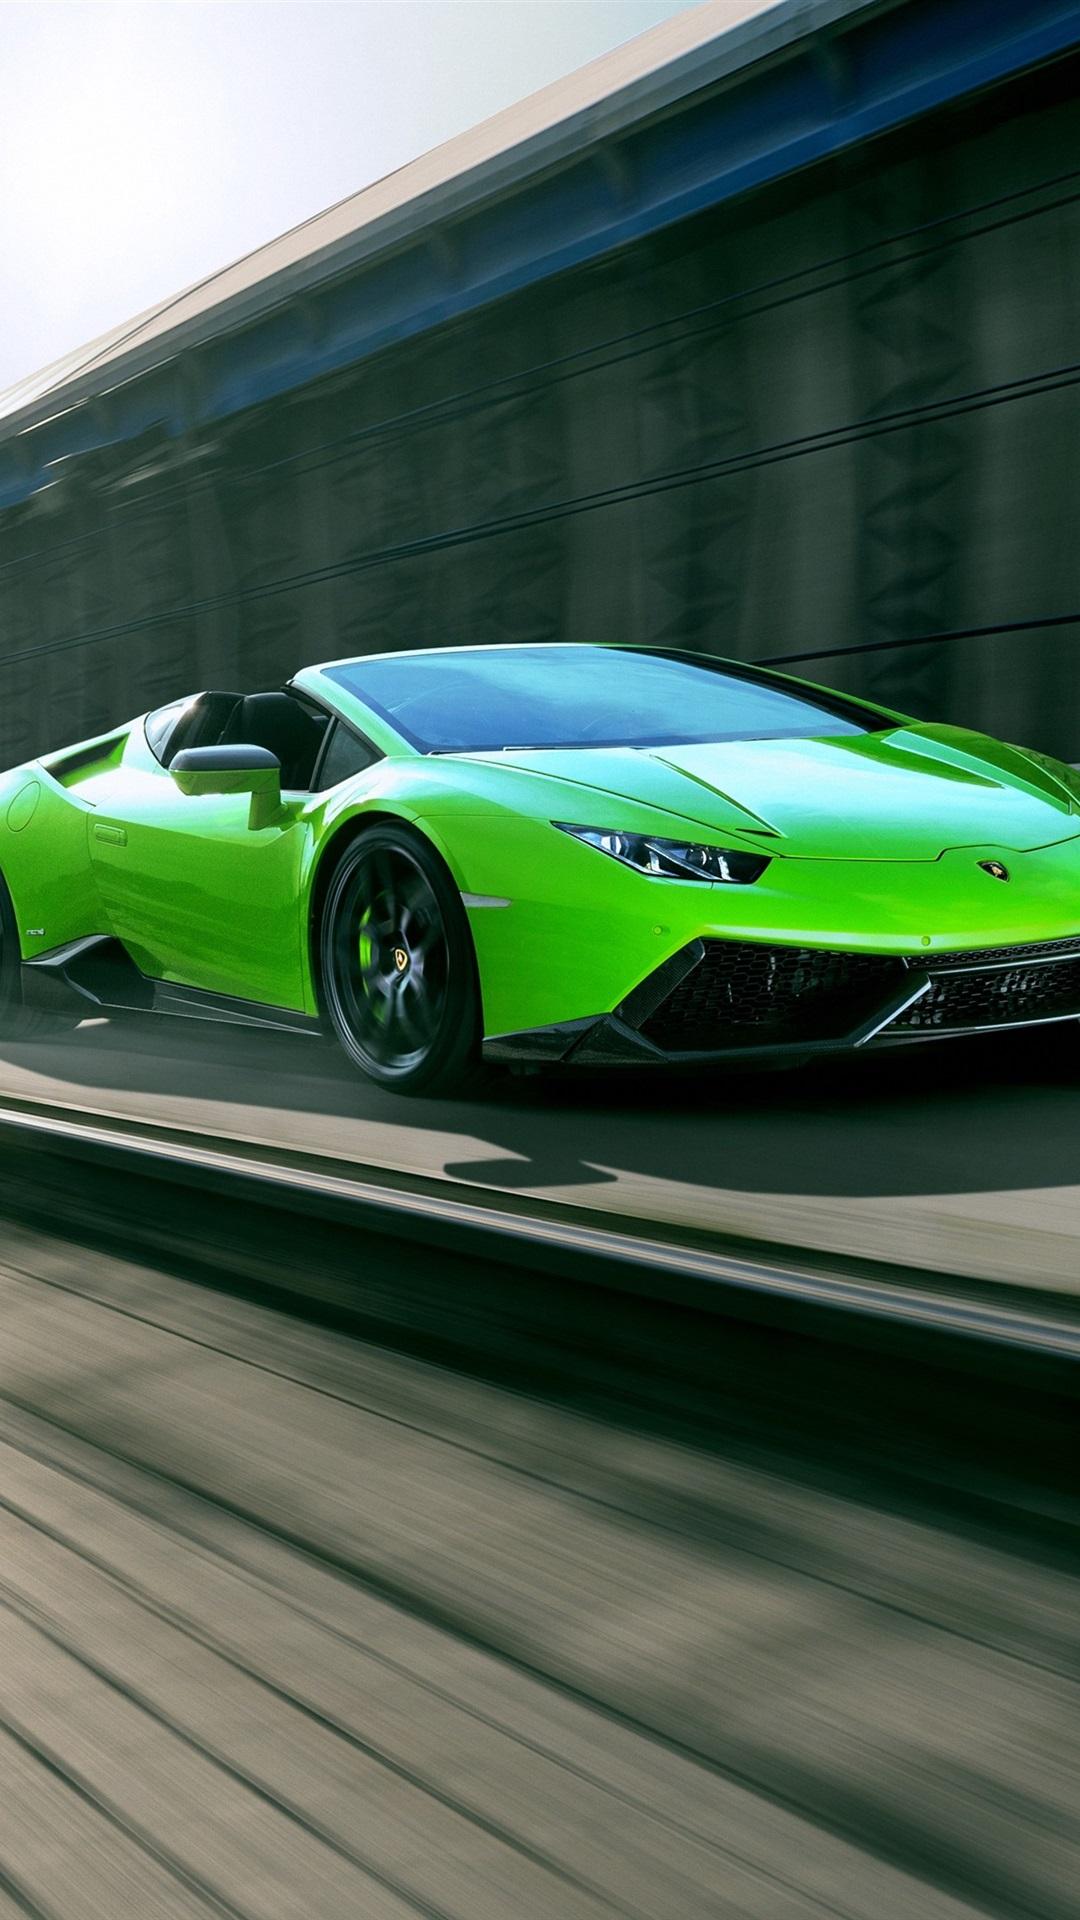 Lamborghini Huracan Spyder Green Supercar High Speed